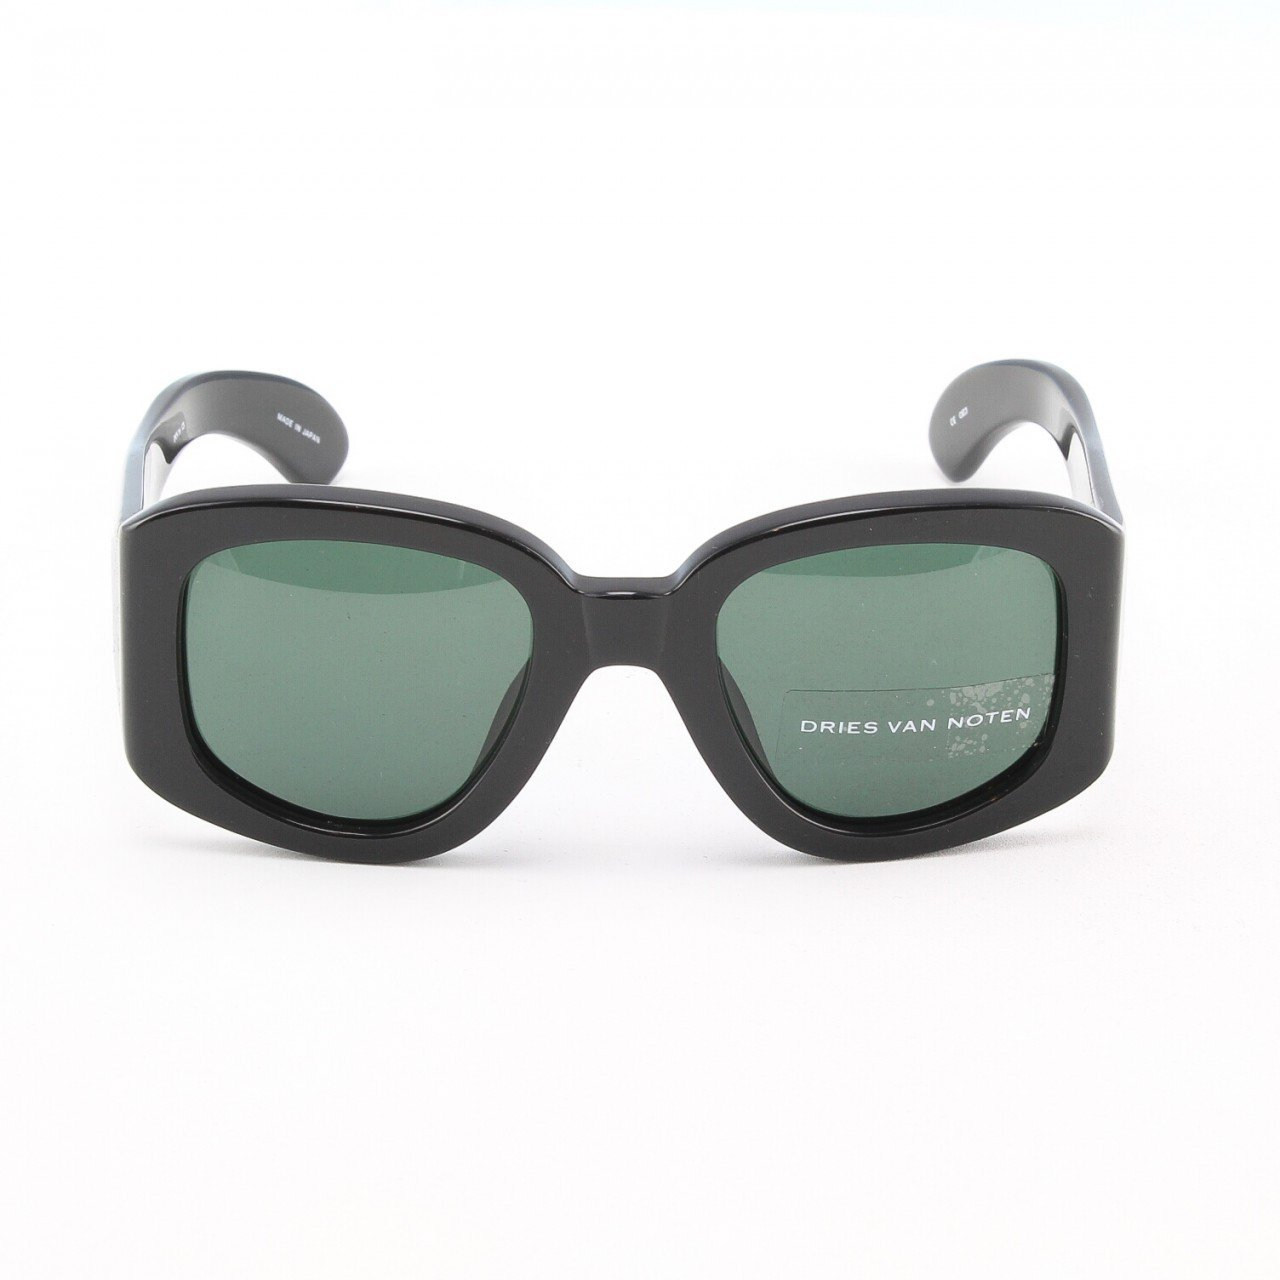 Dries Van Noten x Linda Farrow Women's Black Acetate Angular Sunglasses RARE NWT